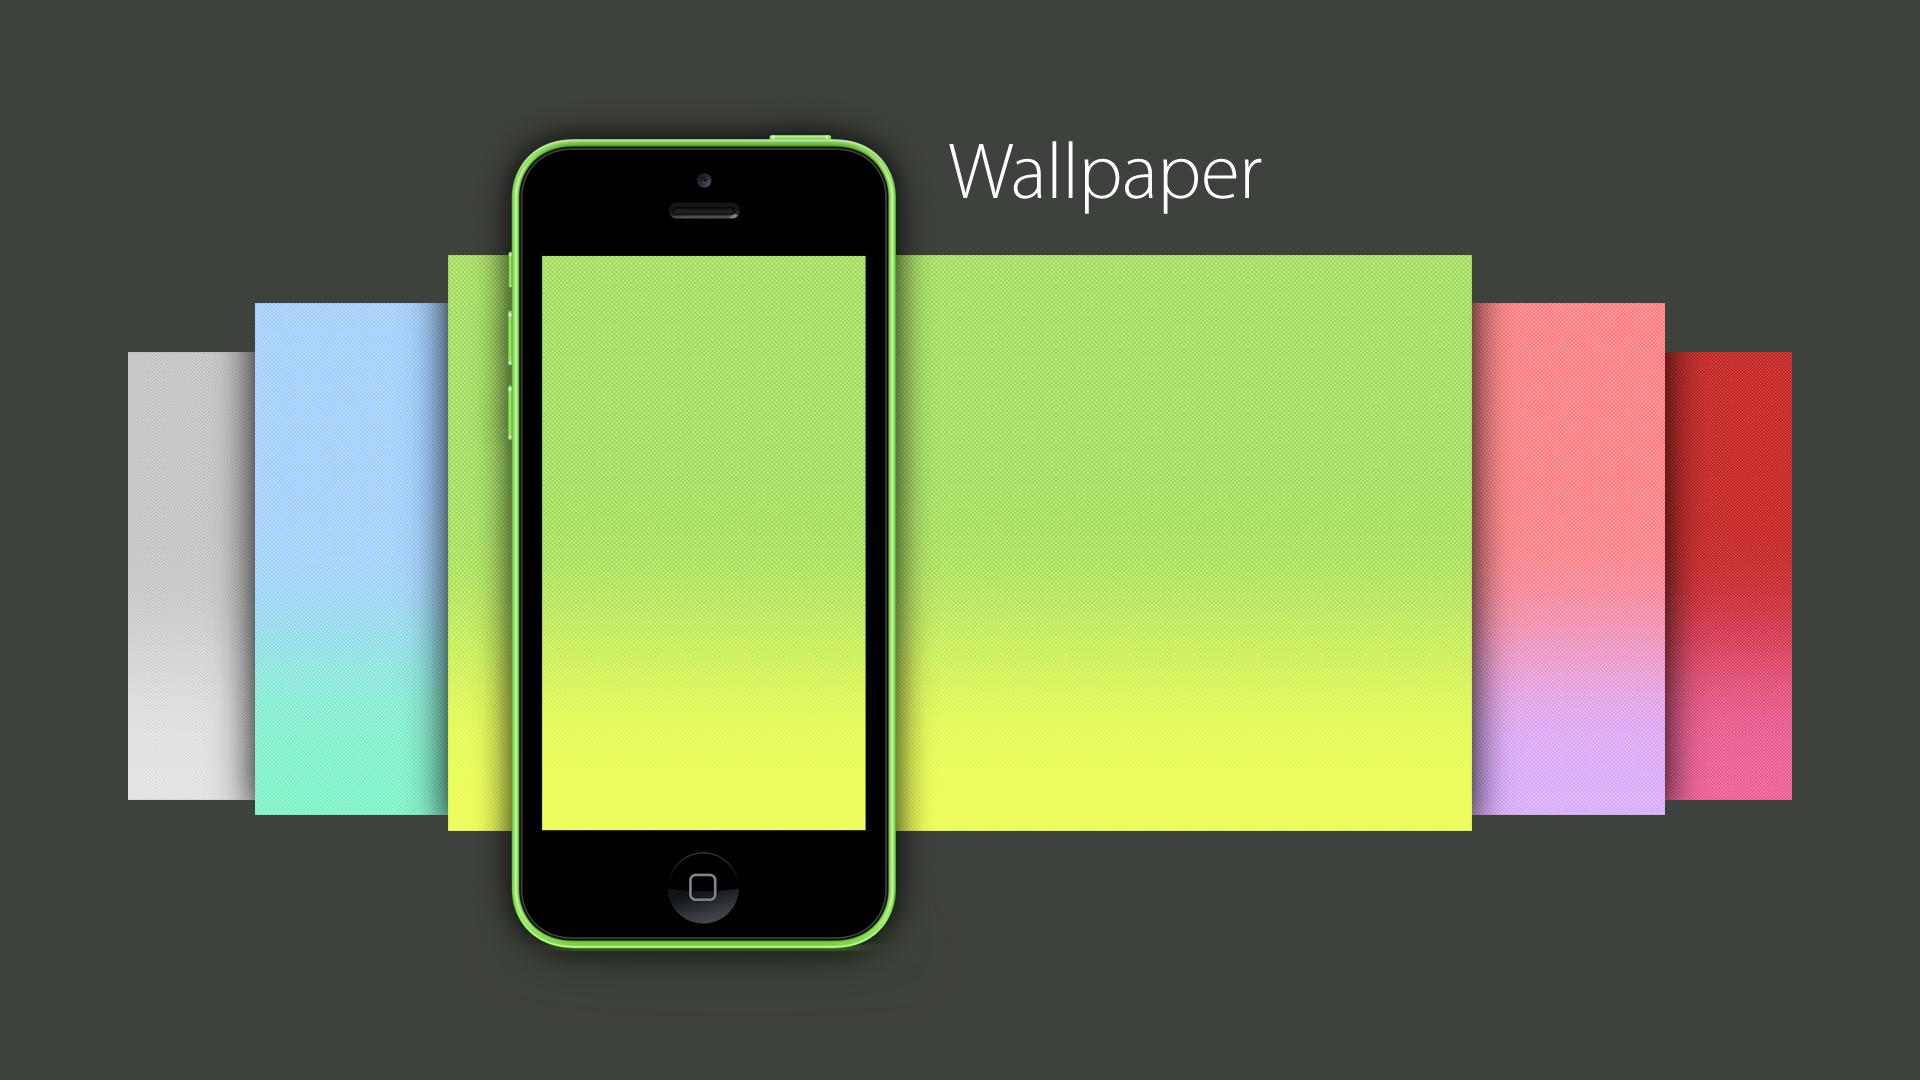 iphone 5c wallpaper by tinylab customization wallpaper mac pc os 2013 1920x1080